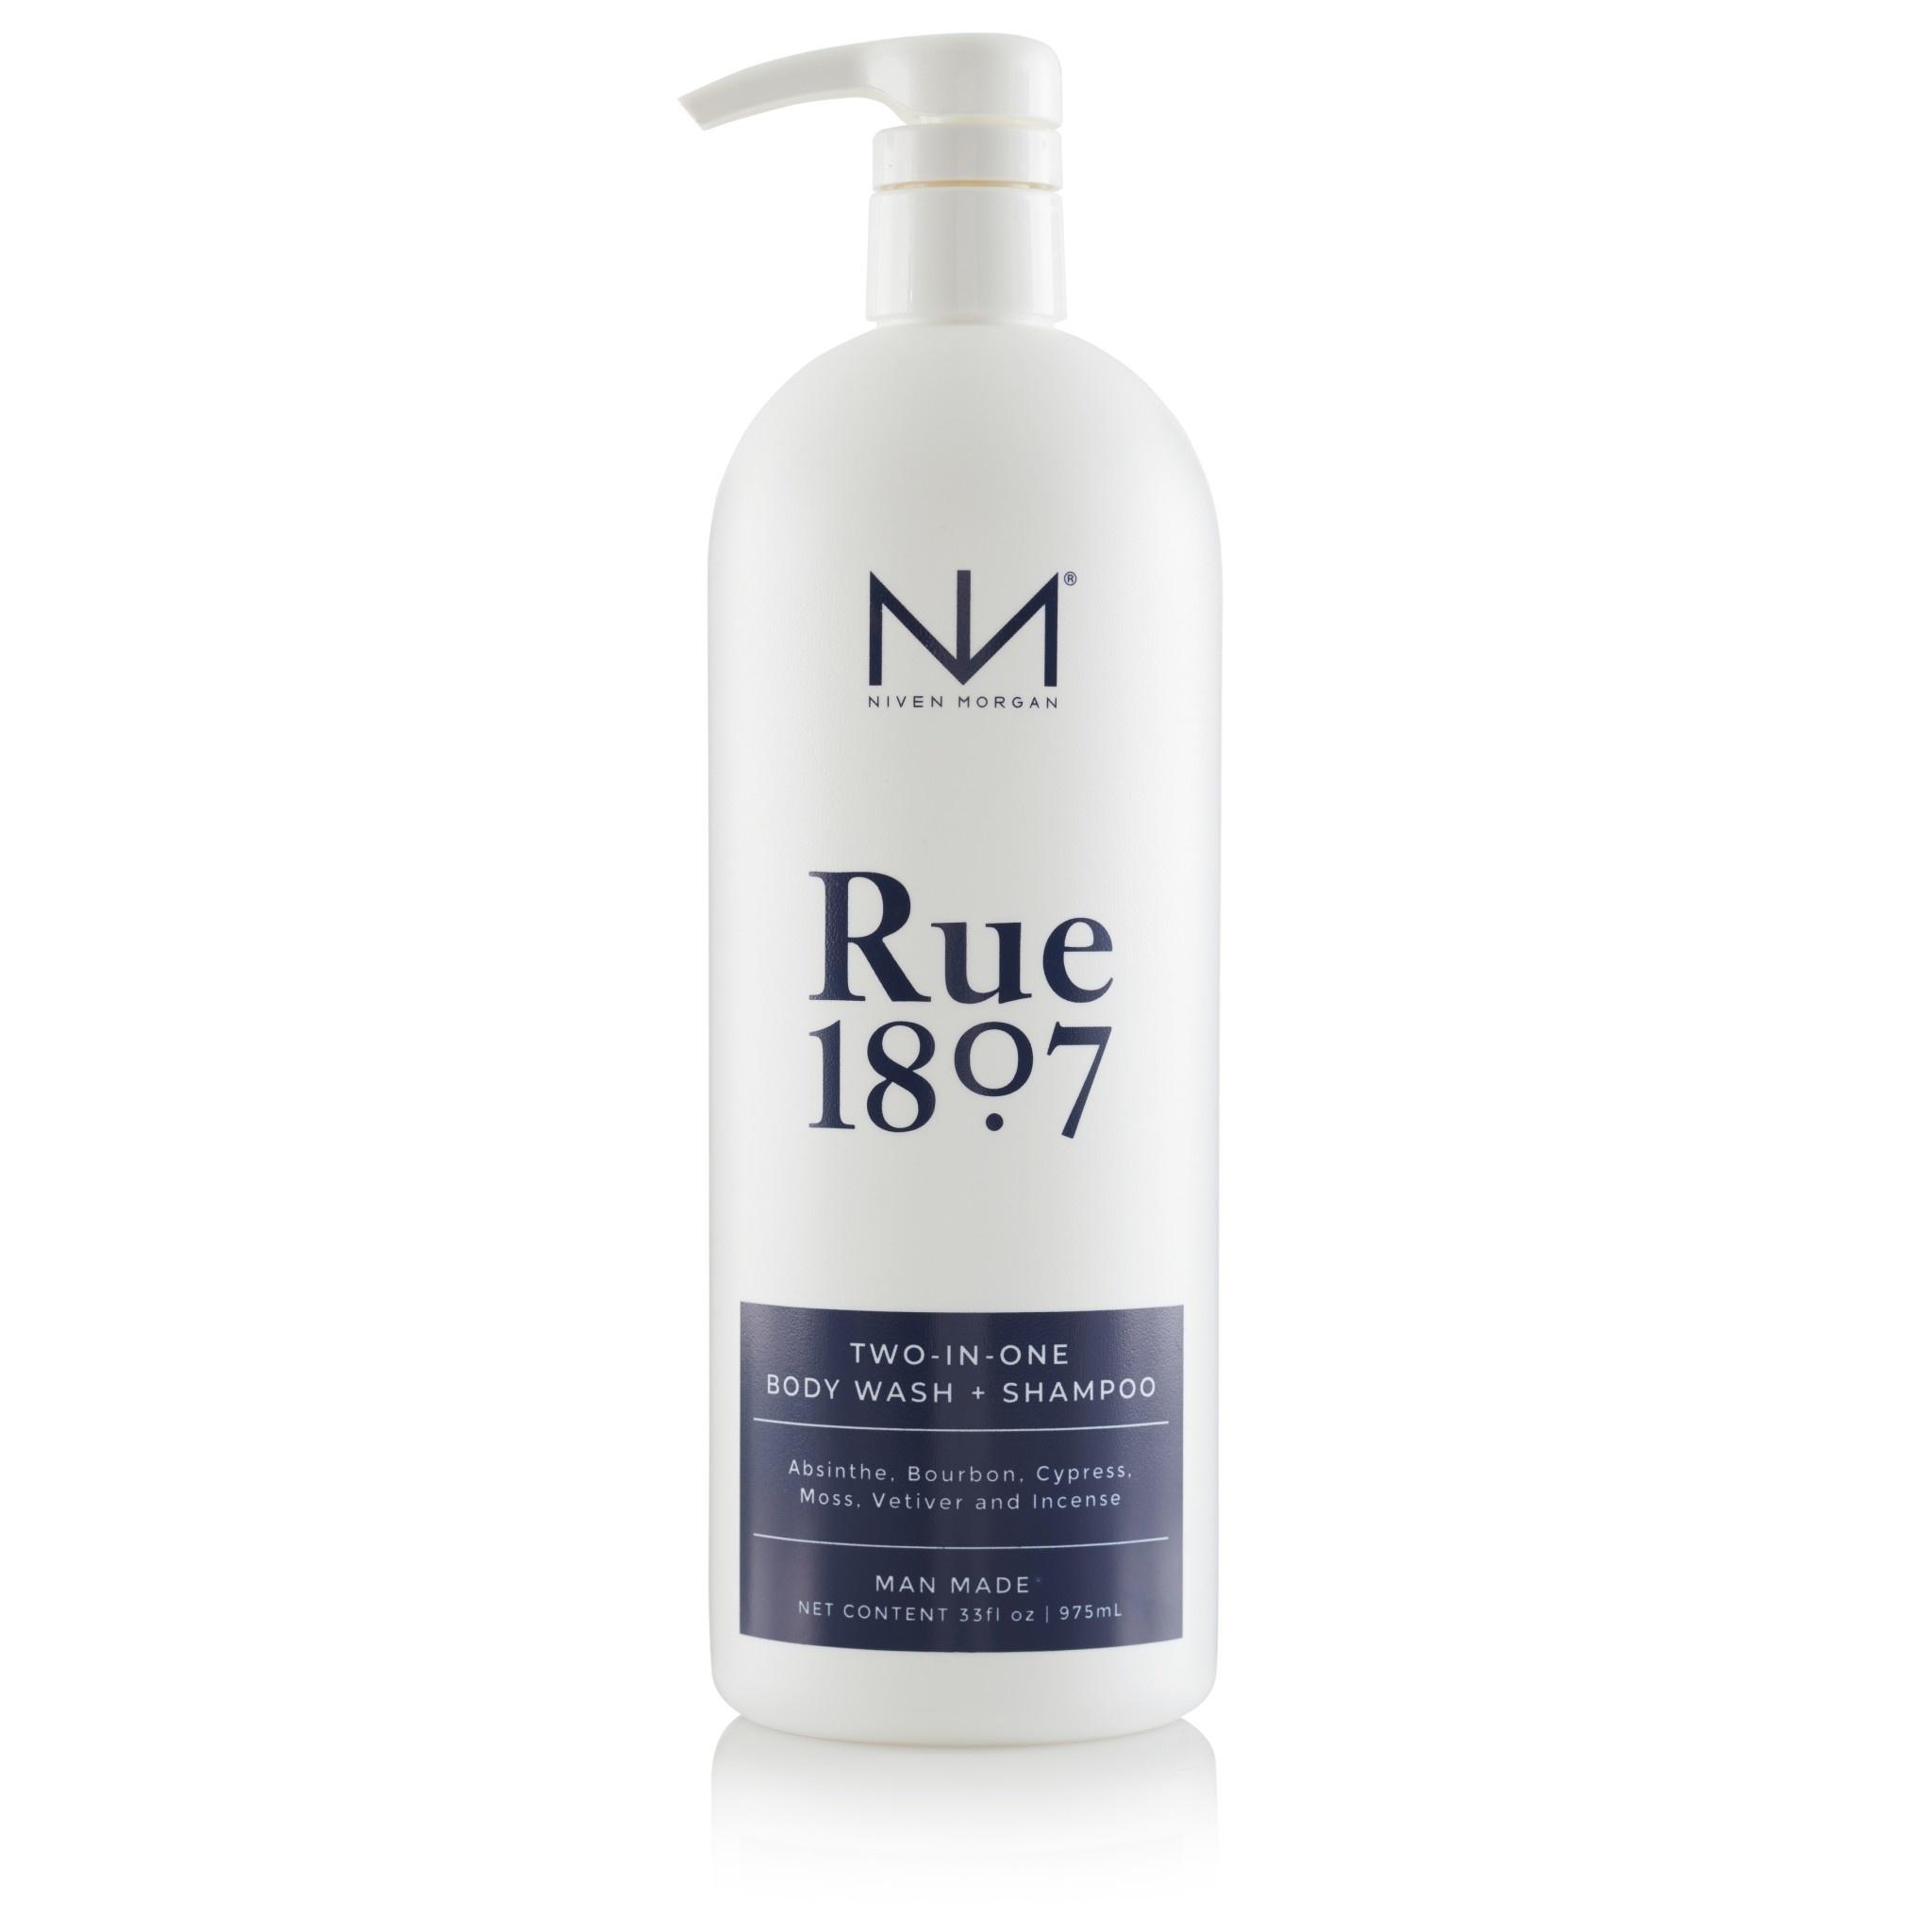 Niven Morgan Body Wash & Shampoo- Rue 1807 33oz